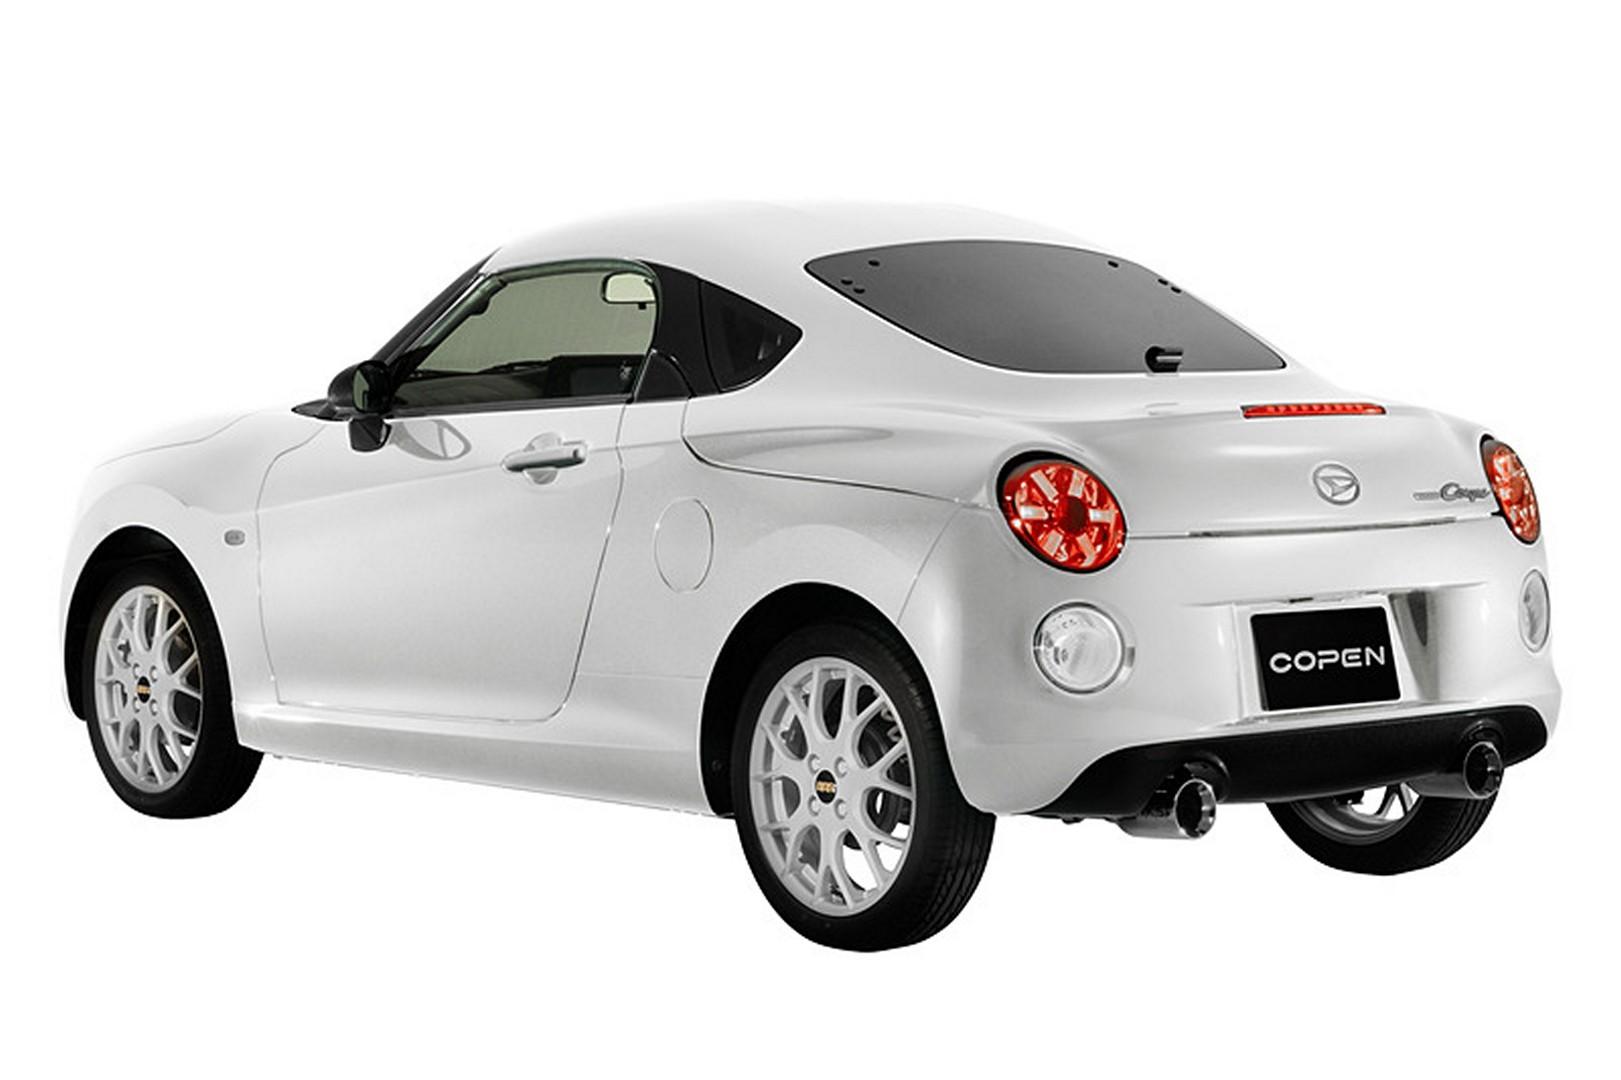 2019-daihatsu-copen-coupe-looks-like-a-budget-alfa-4c-or-alpine-a110_7